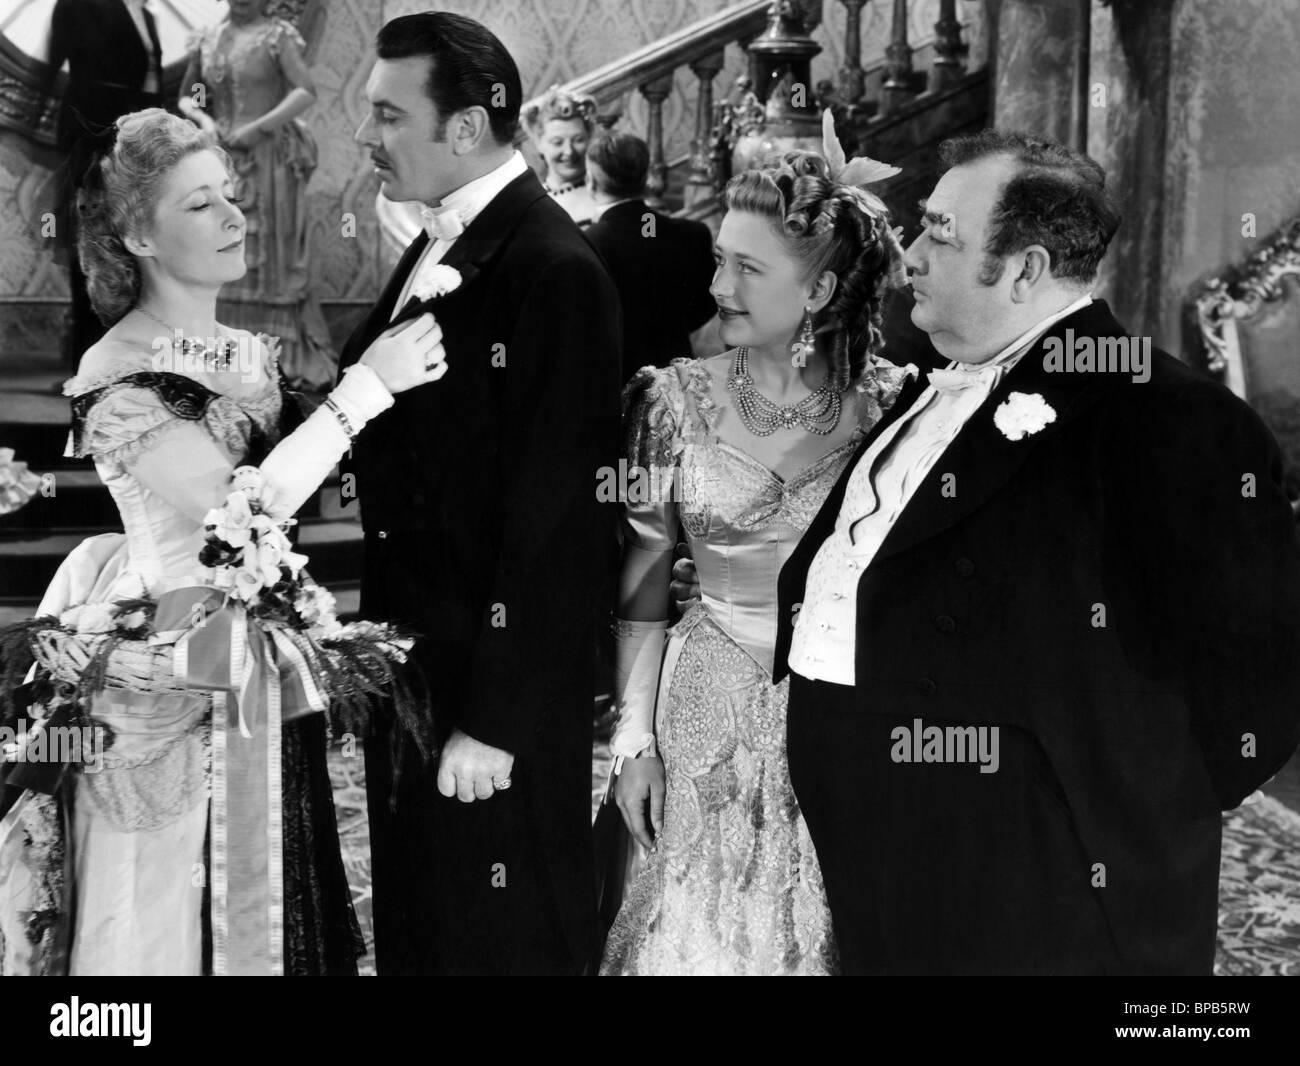 GEORGE BRENT, PRISCILLA LANE, EUGENE PALLETTE, SILVER QUEEN, 1942 - Stock Image